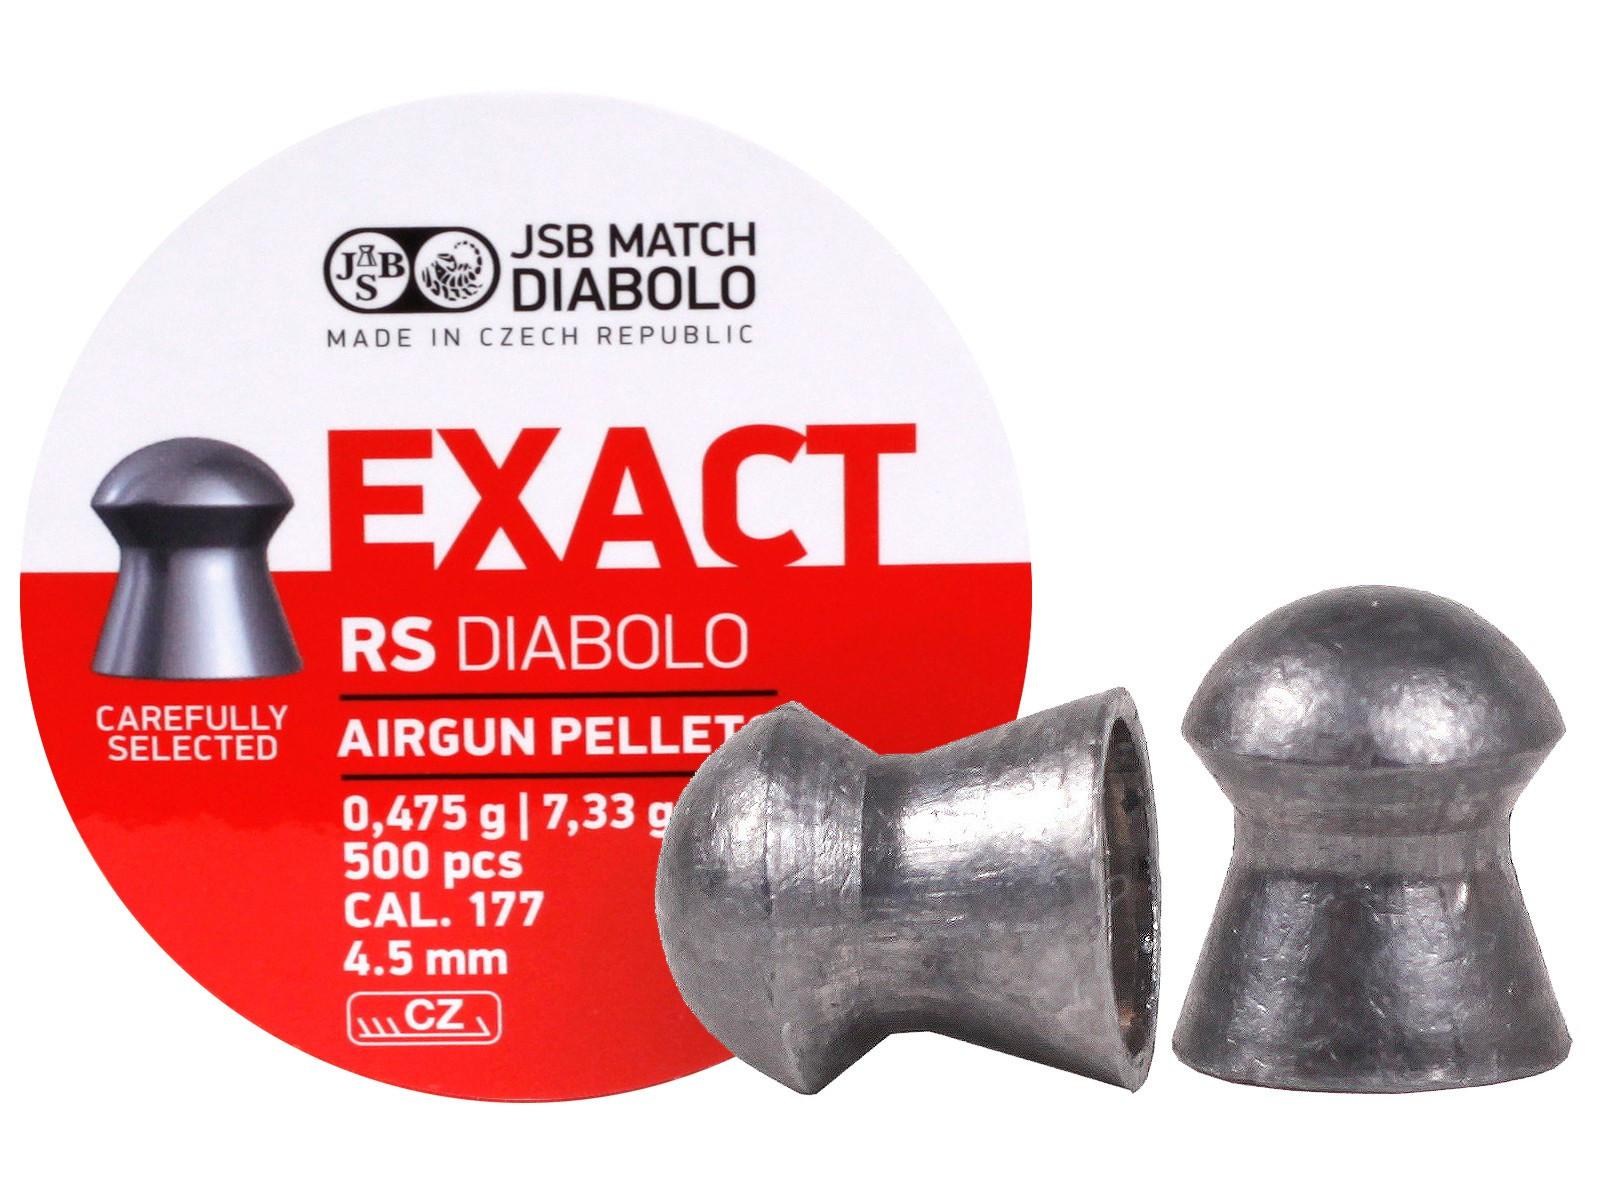 JSB Diabolo Exact RS .177 Cal, 7.33 gr - 500 ct